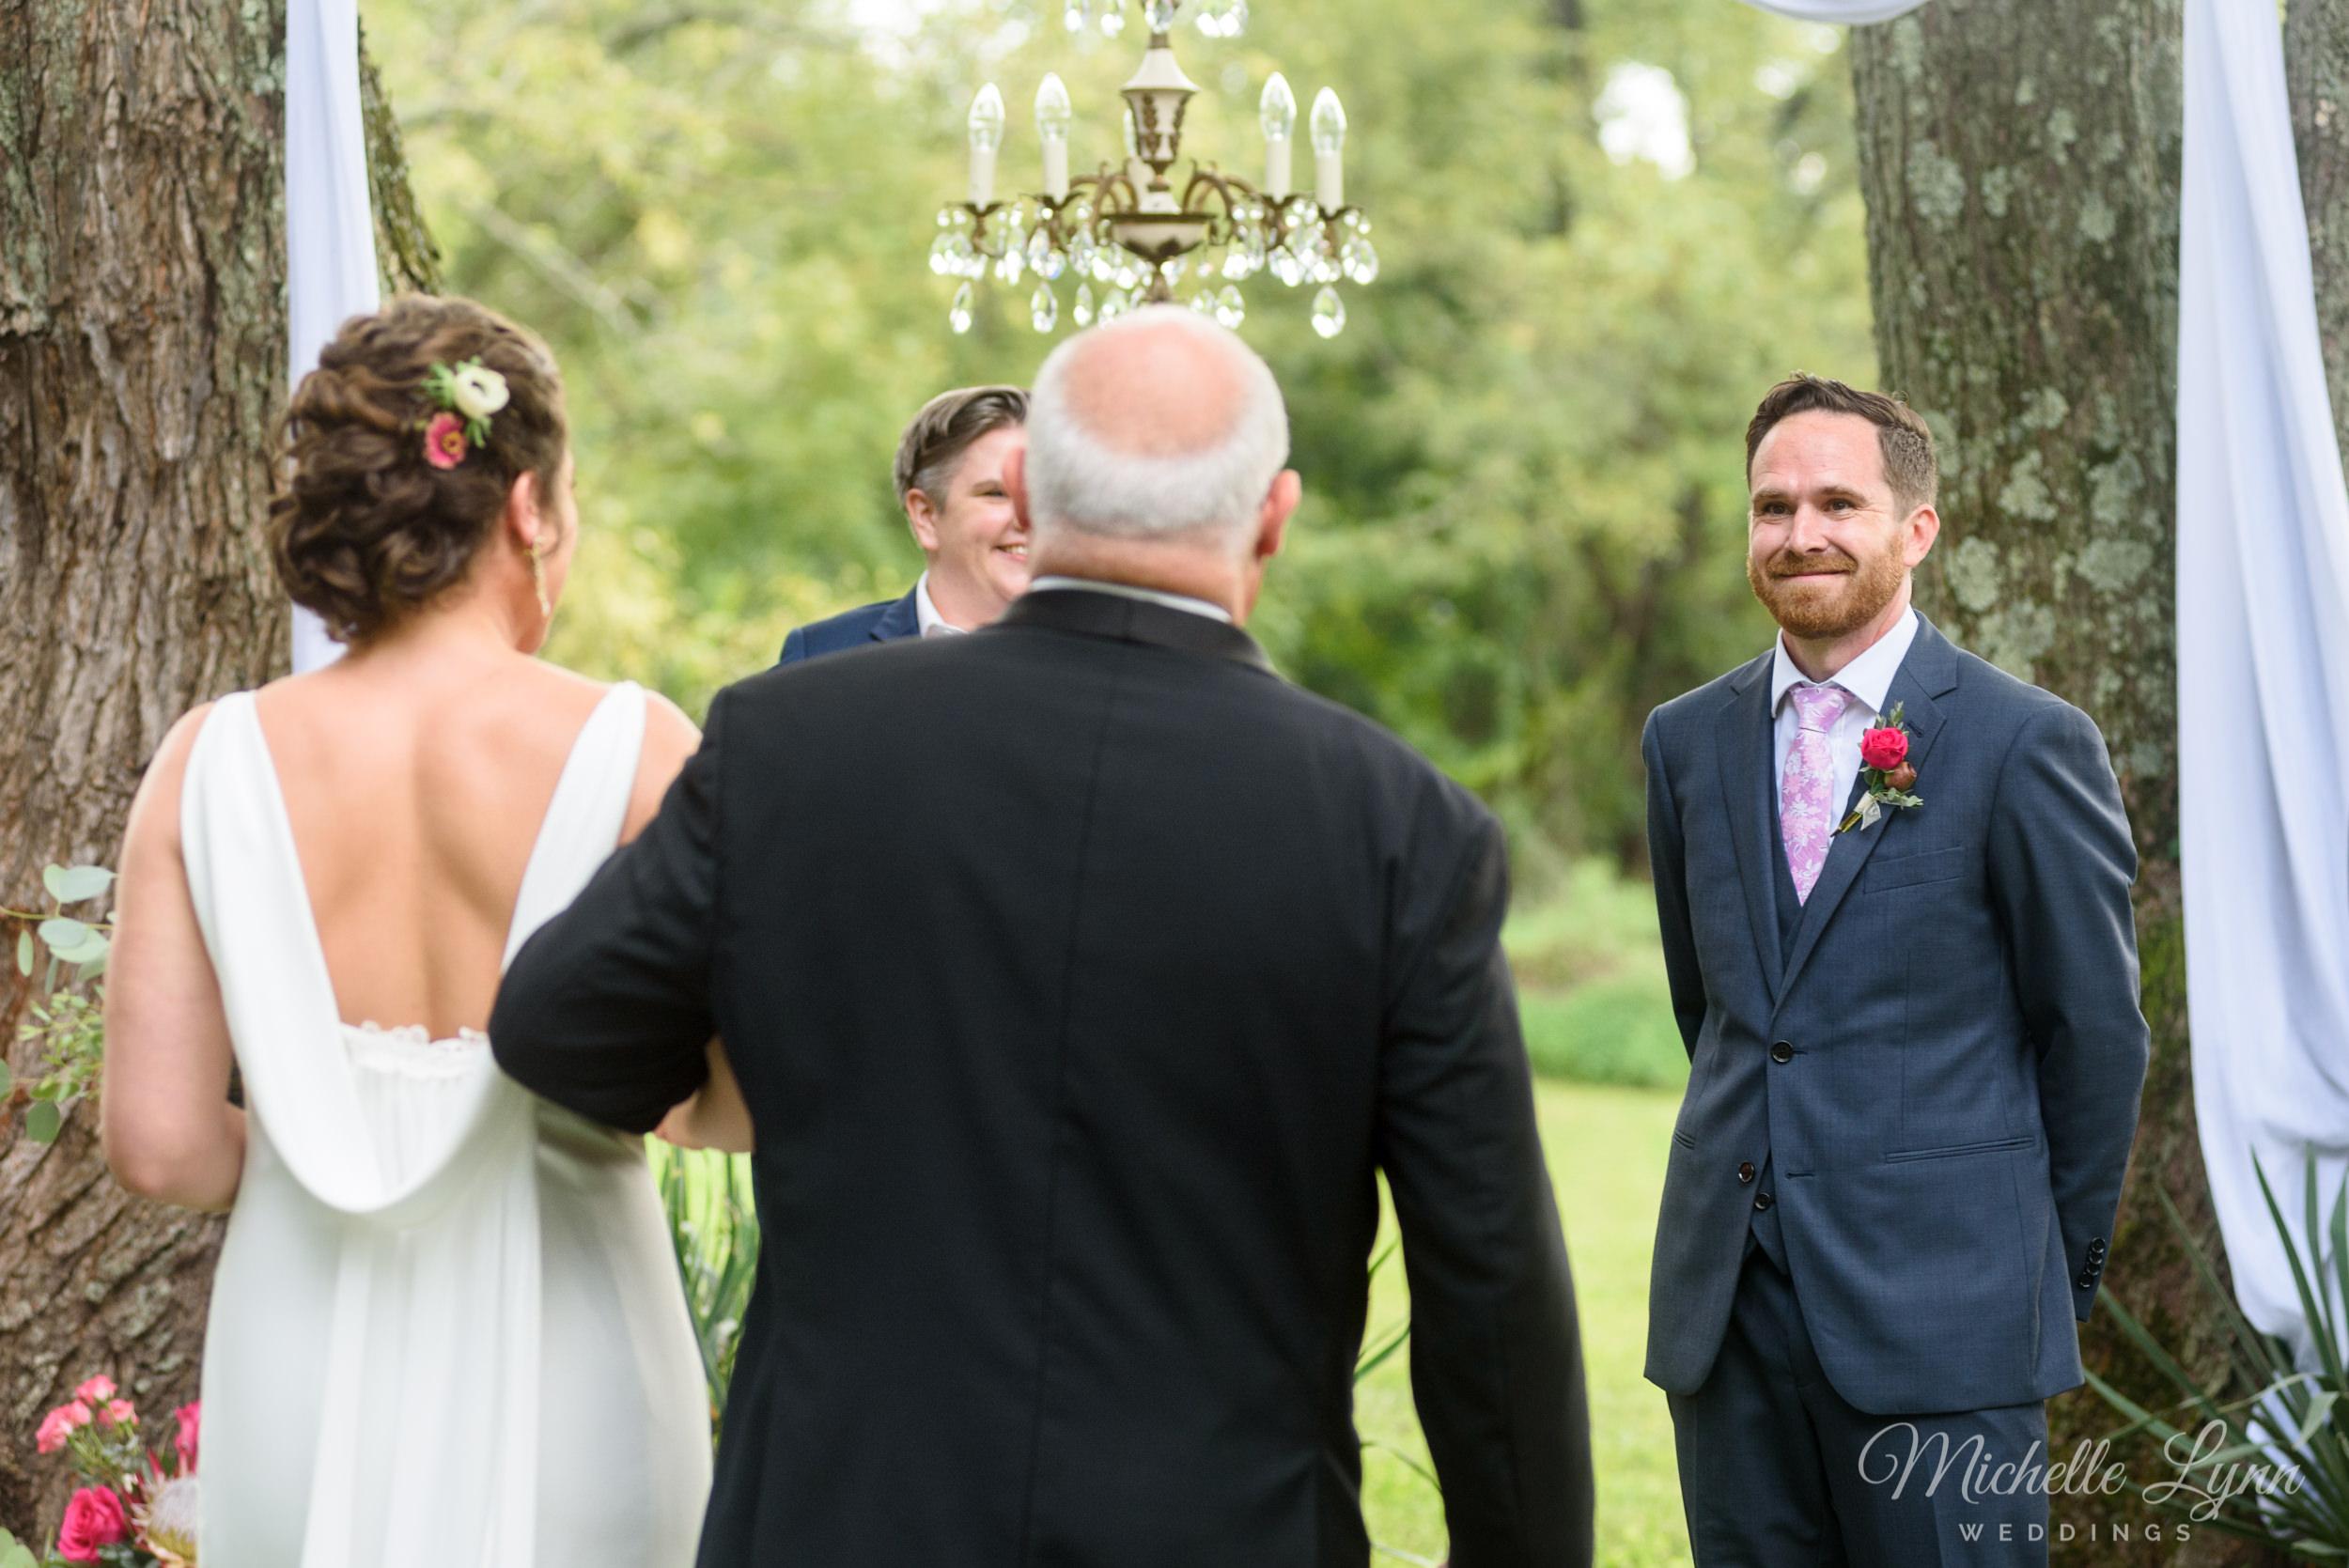 mlw-unionville-vineyards-nj-wedding-photography-35.jpg